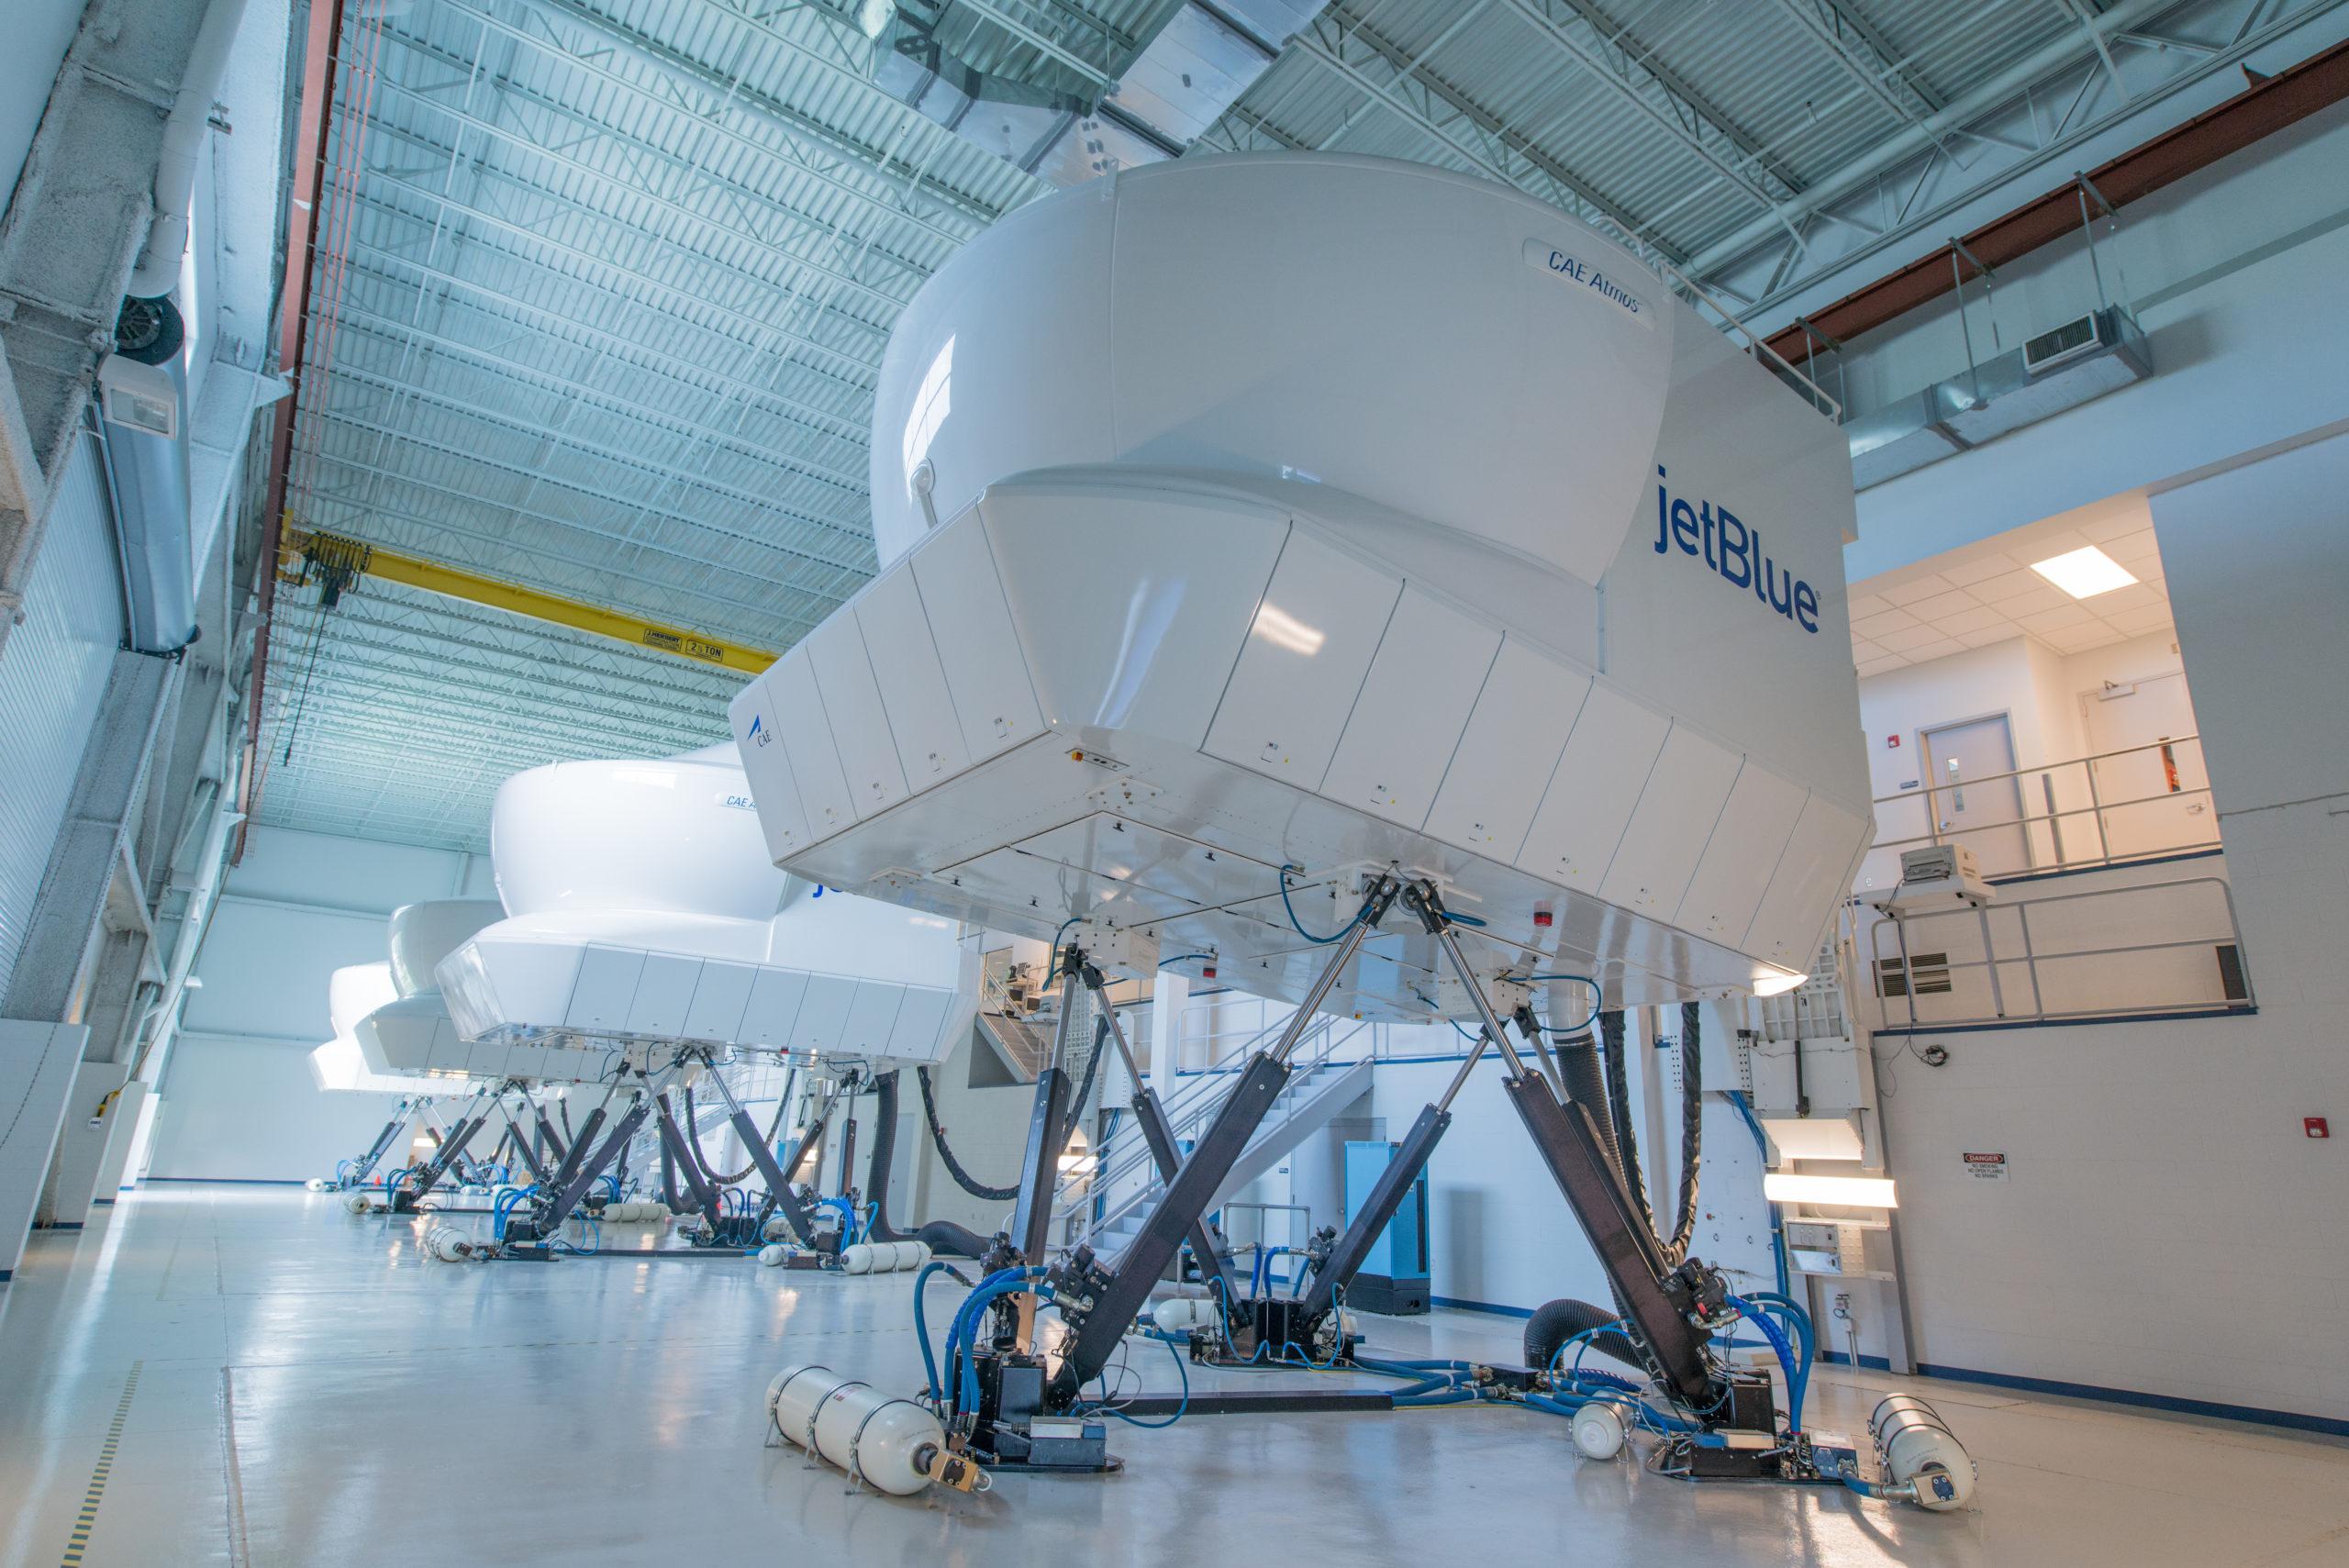 JetBlue training simulator